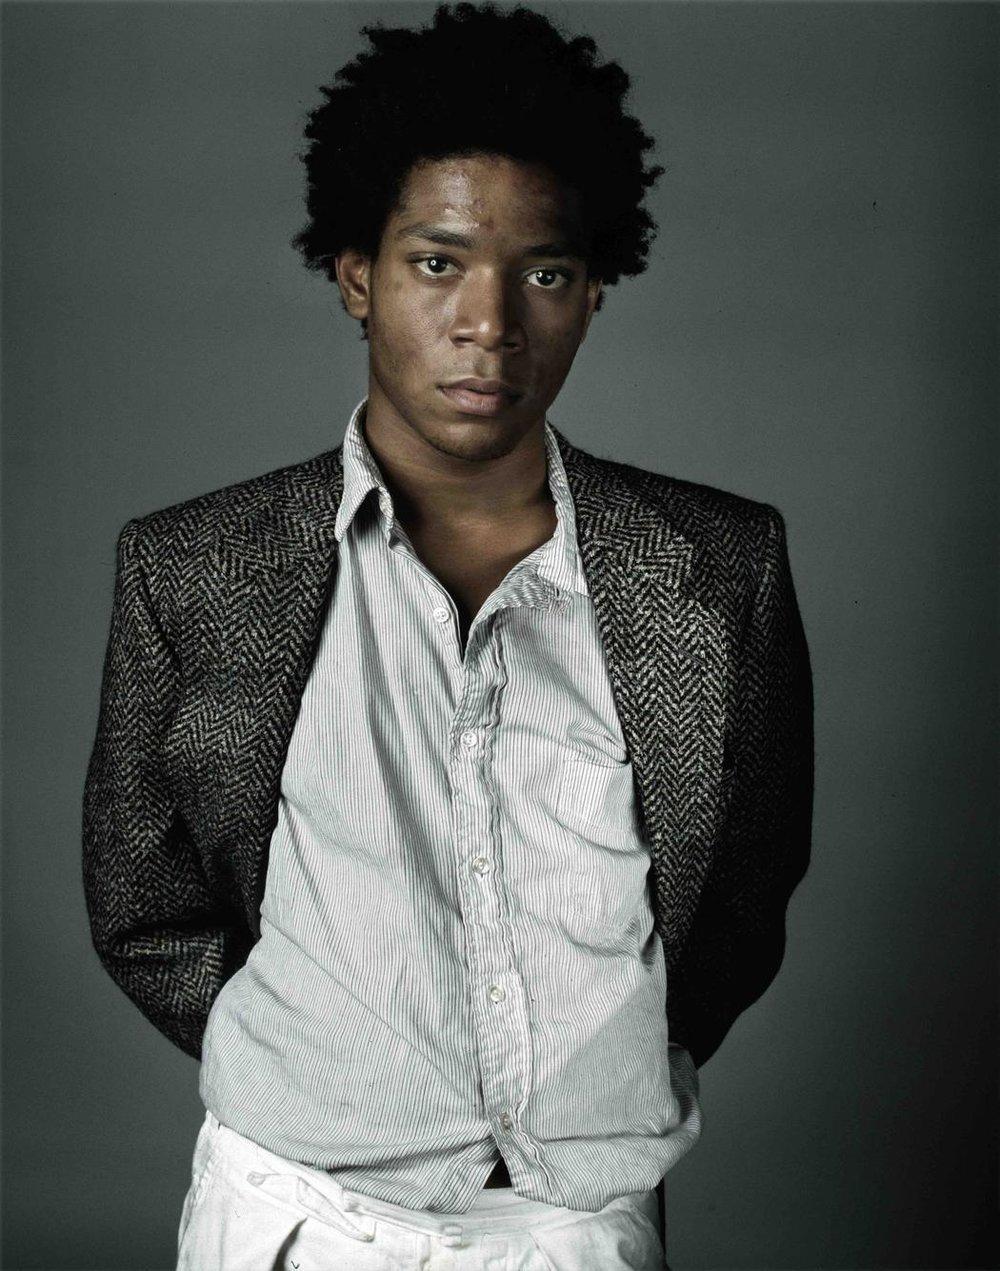 Richard-corman-basquiat-profile-photo-1.jpg